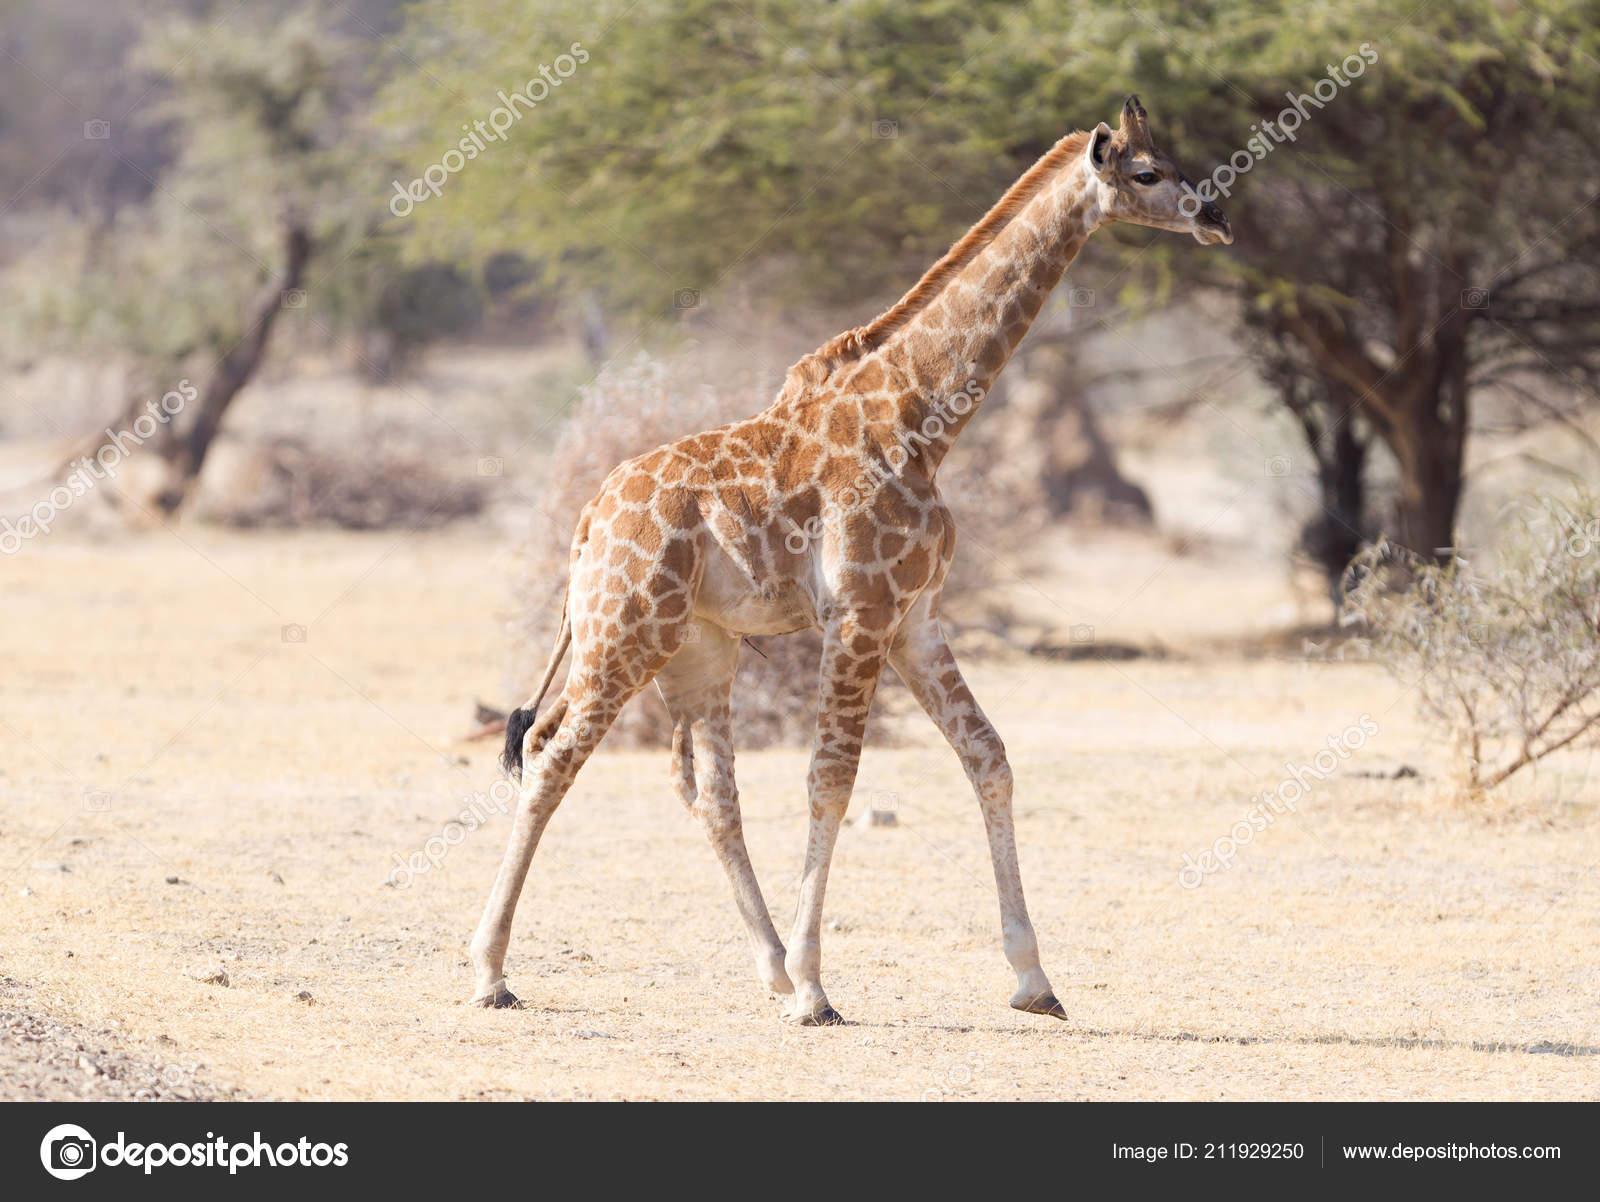 Namibia incontri single